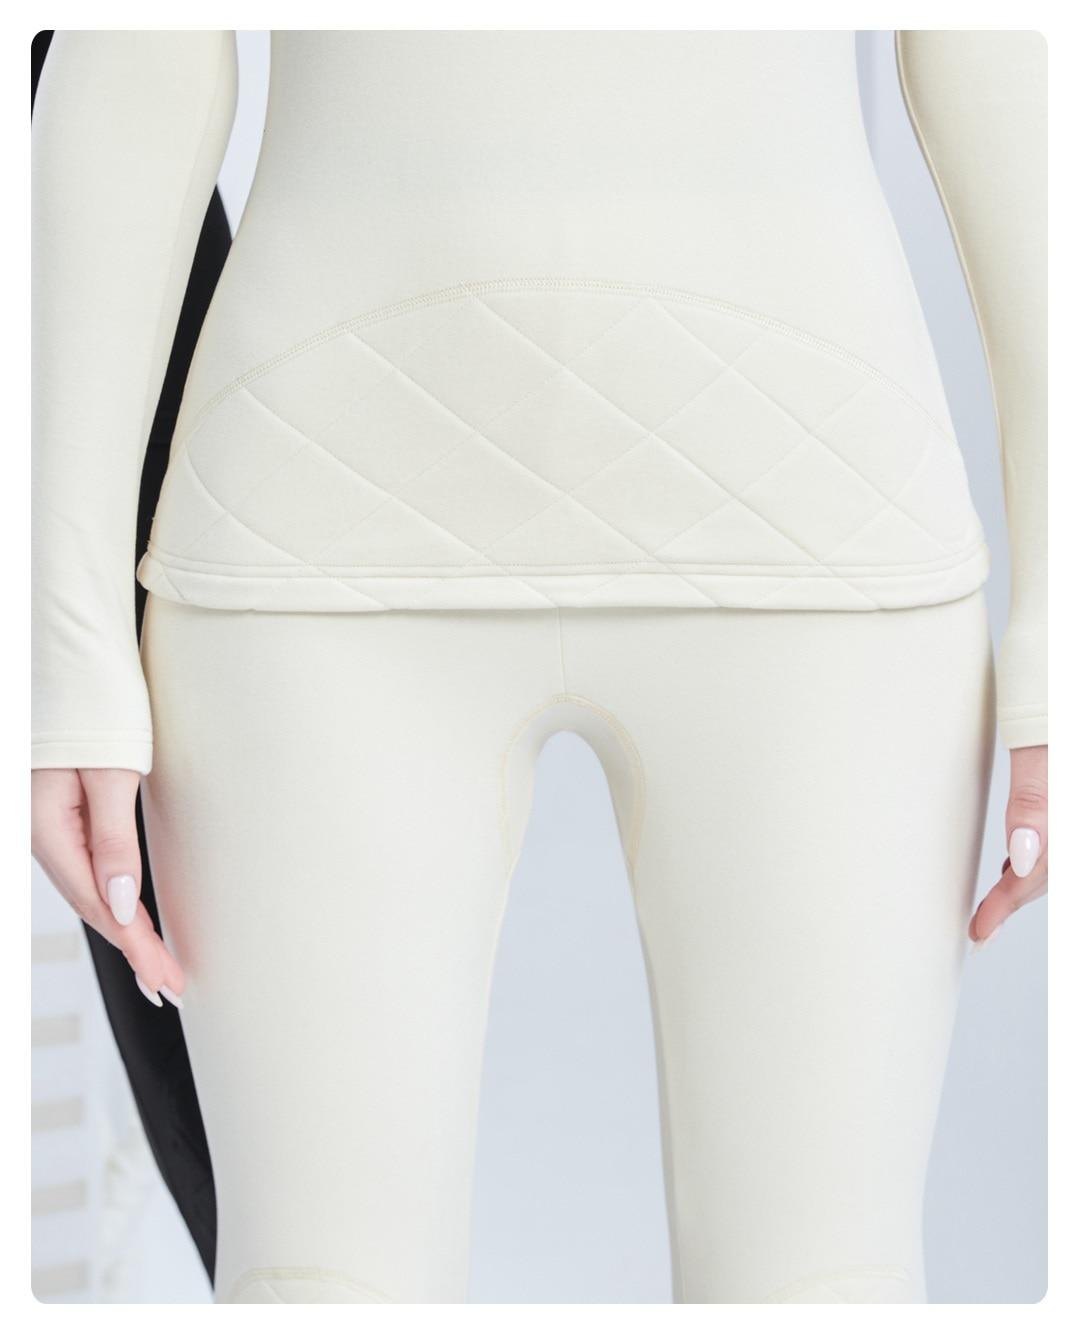 pele-friendly inverno clothingsuit